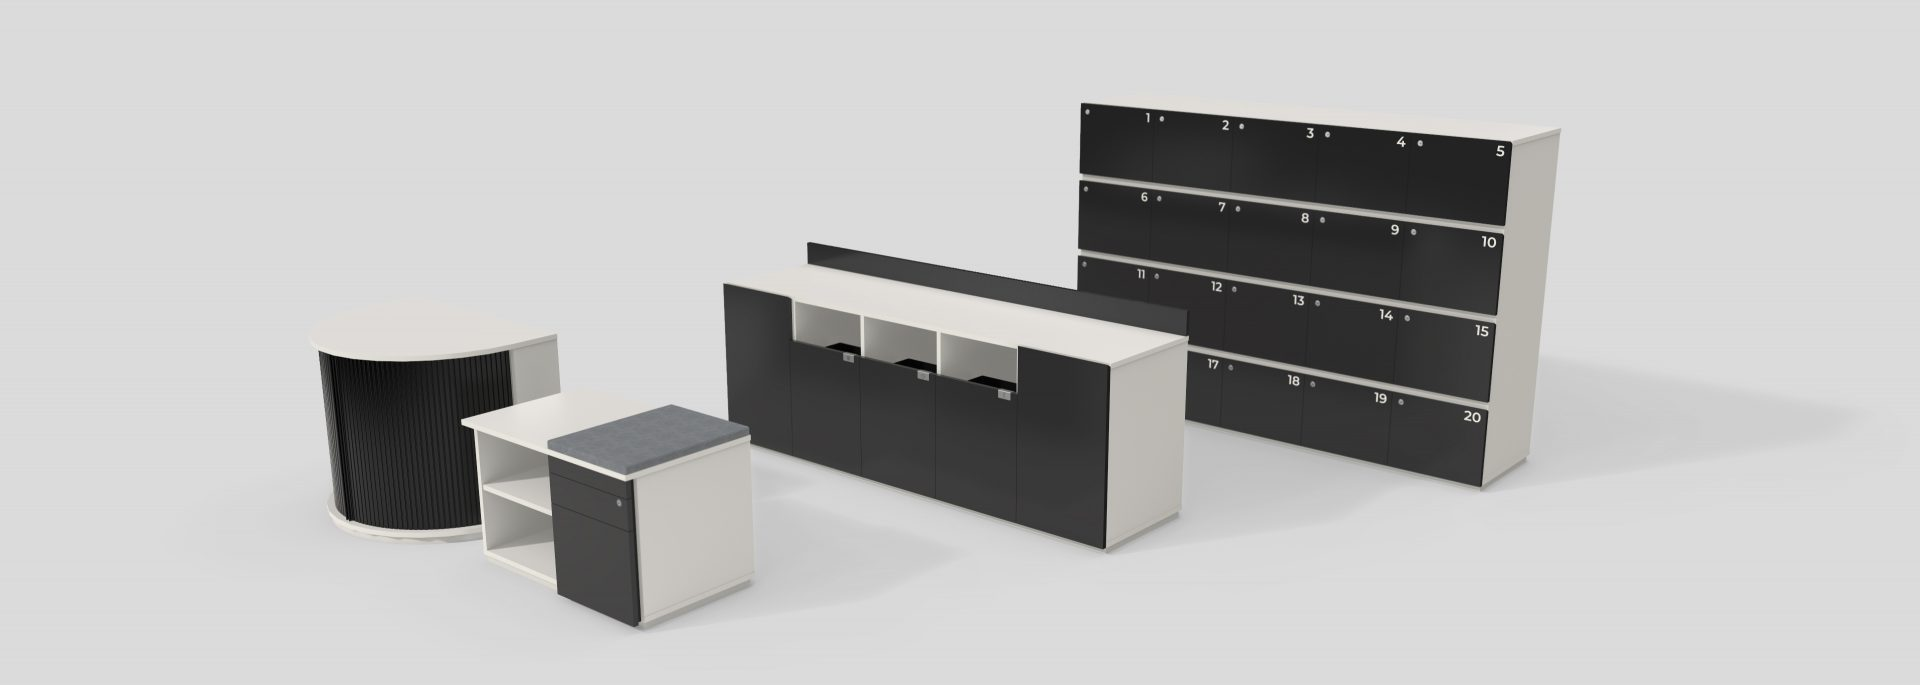 horizon-control-consoles-storage